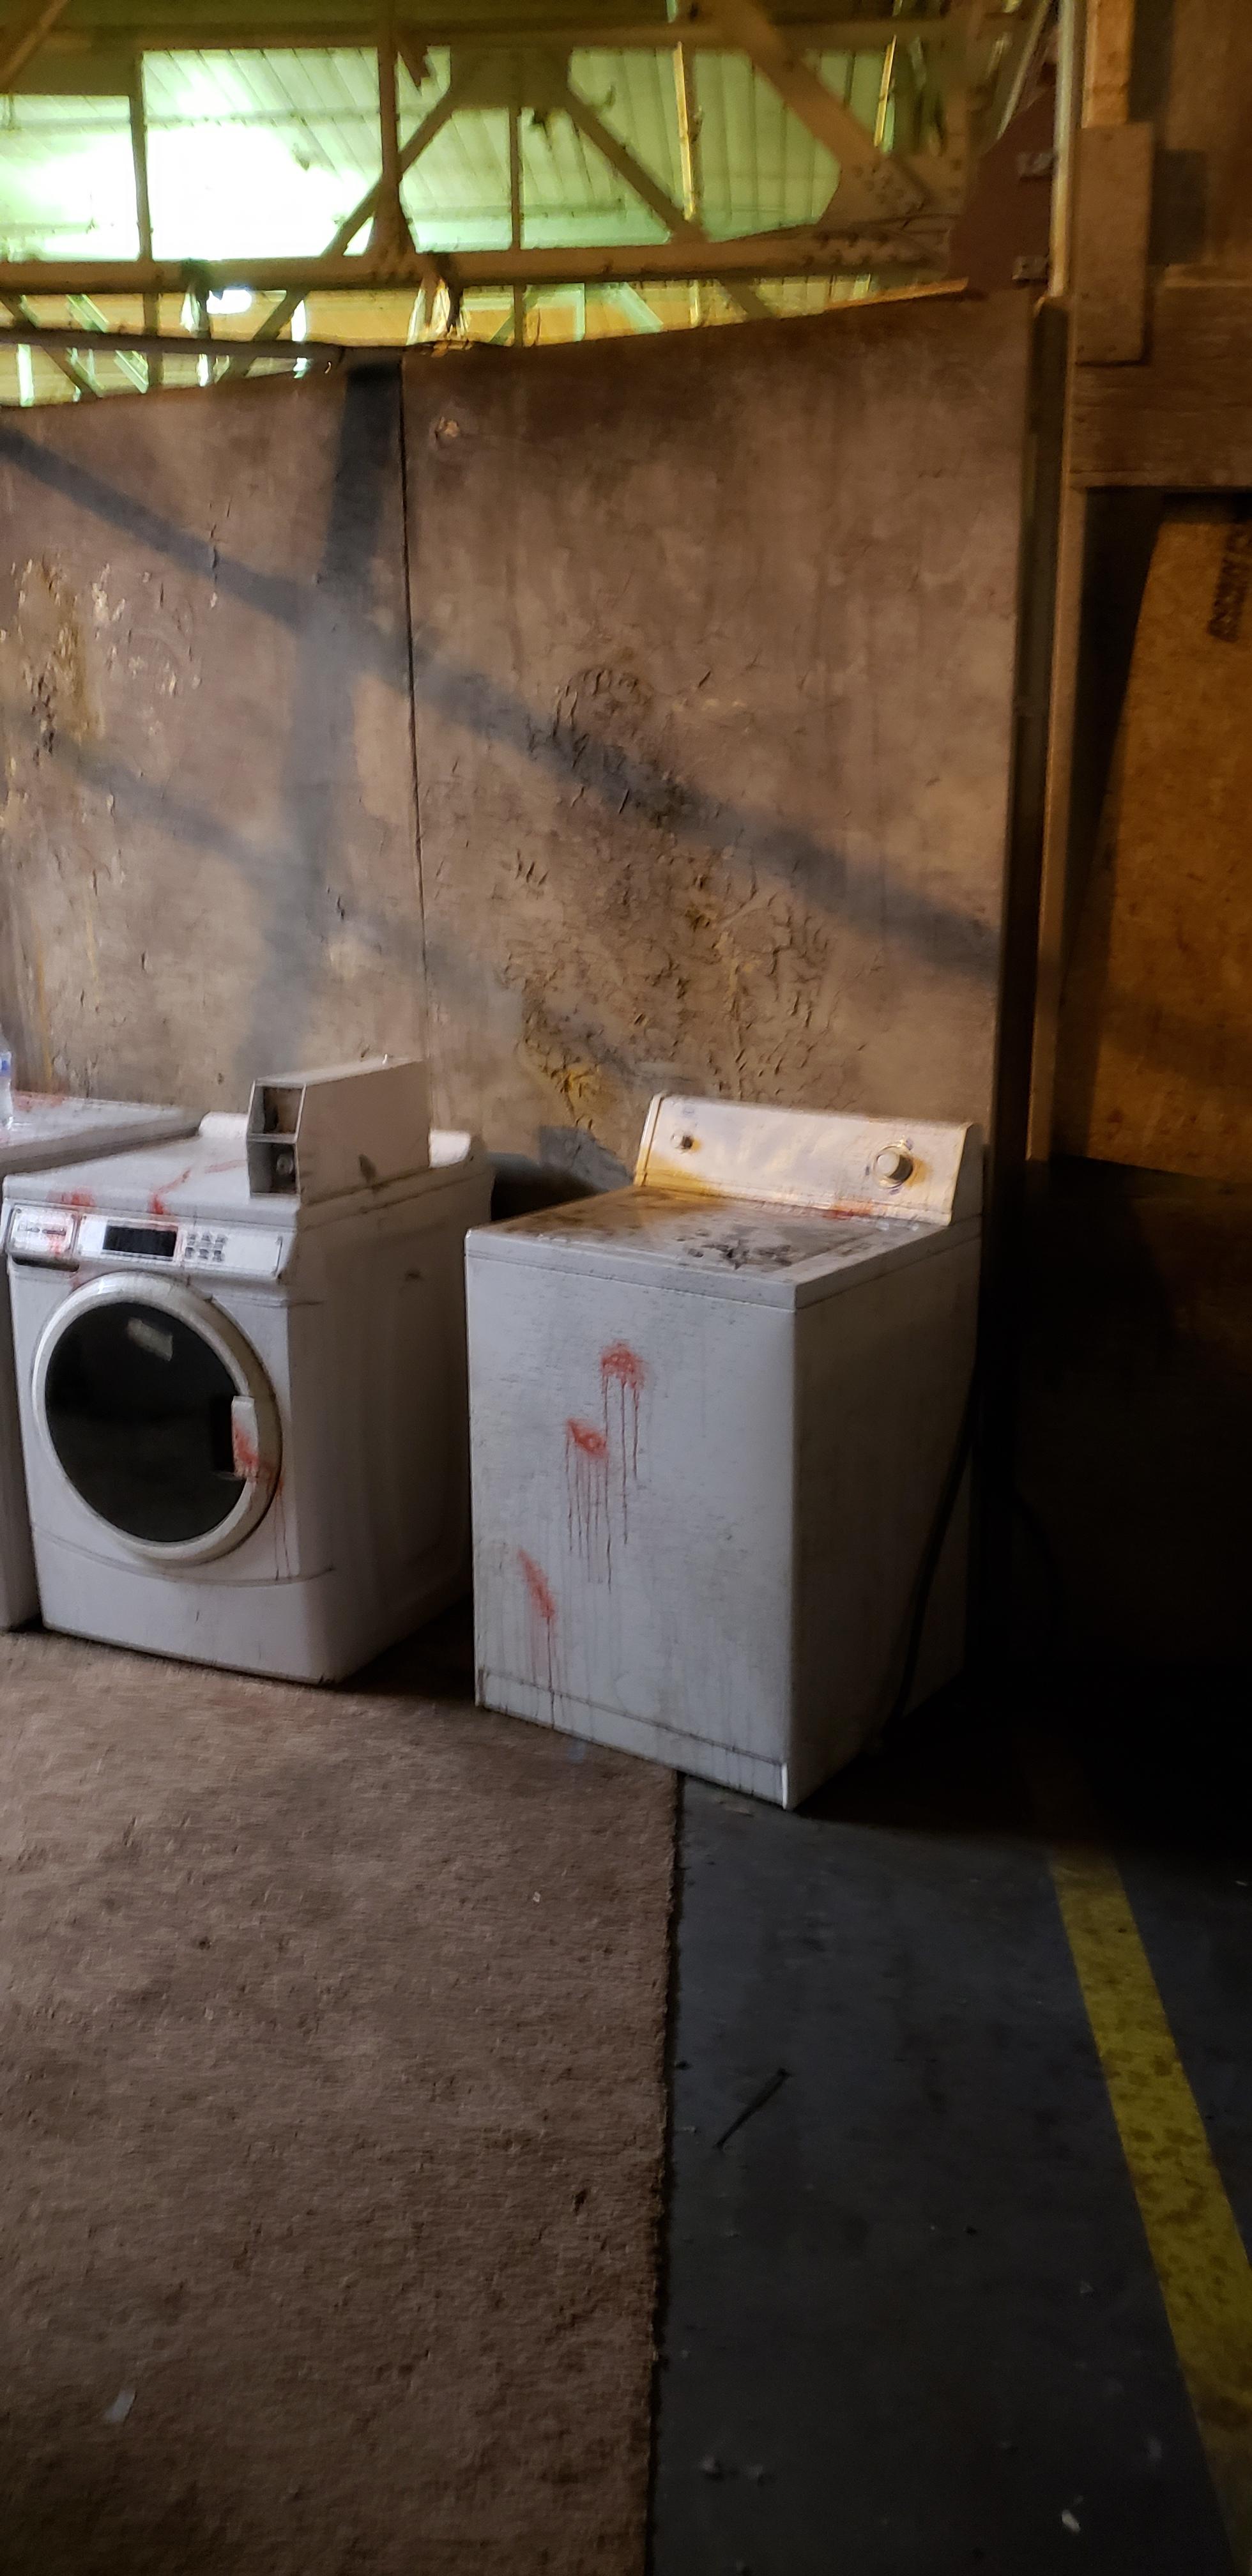 21 8 Laundromat